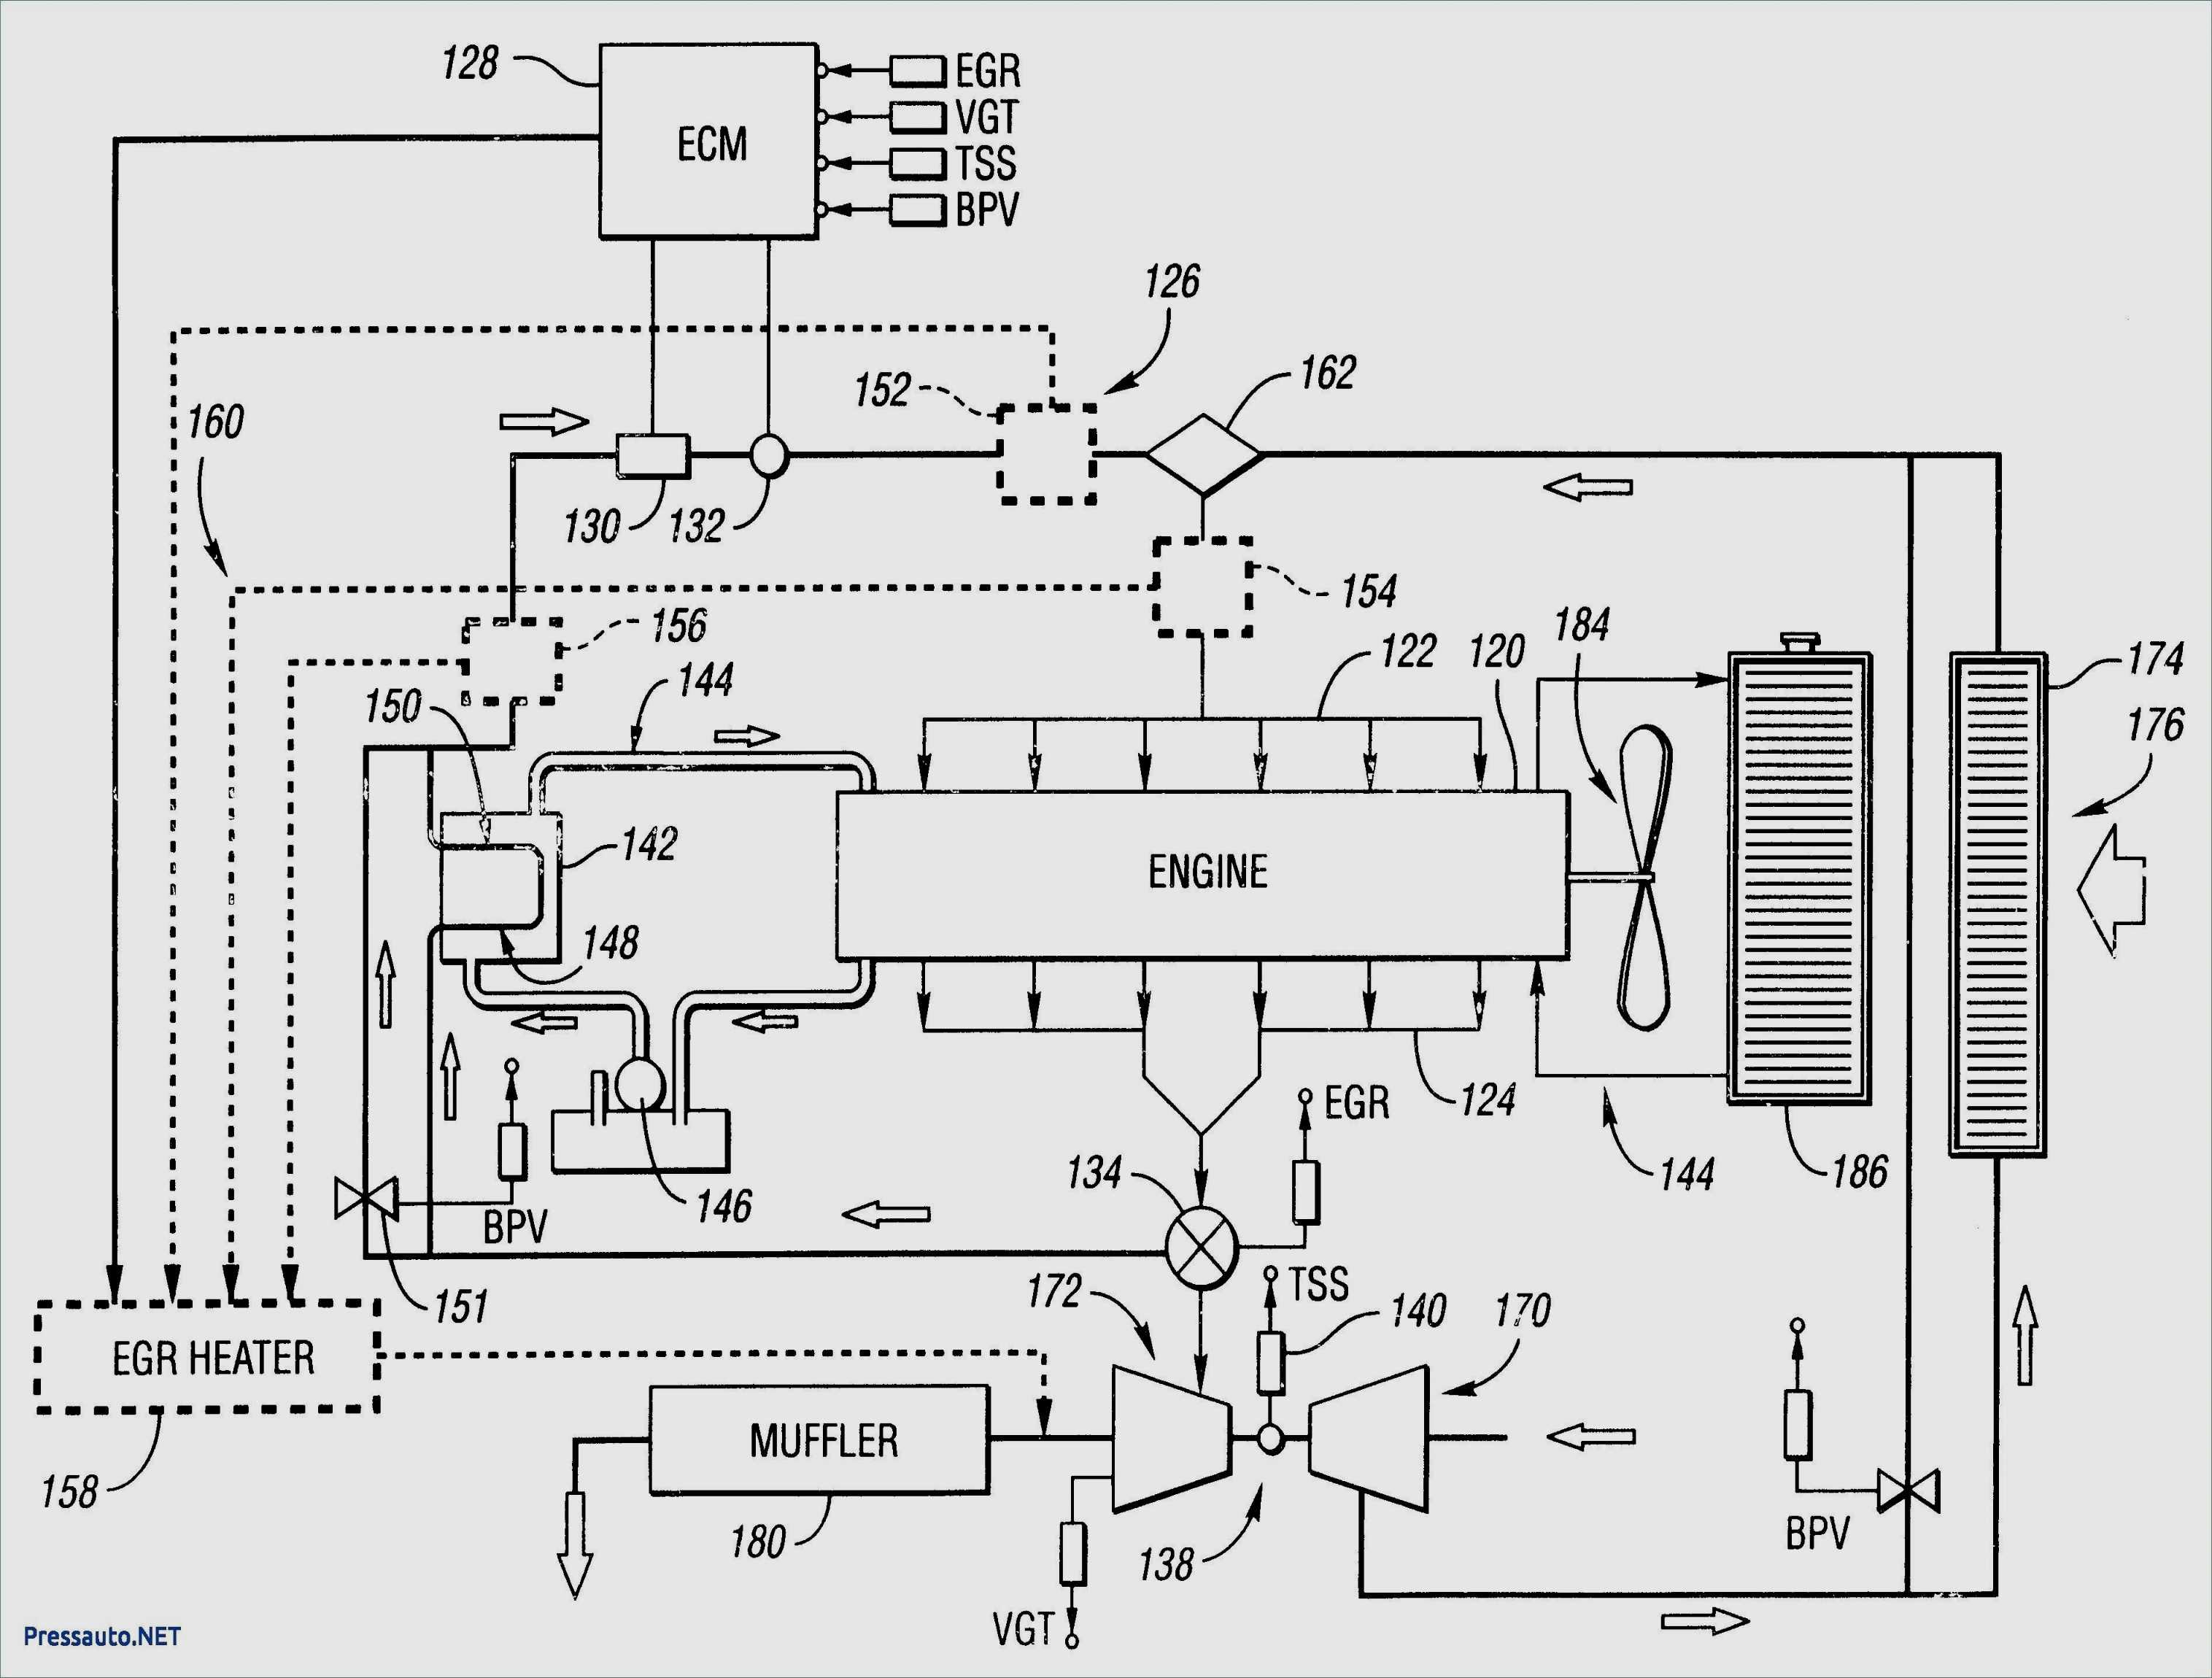 Intertherm Heaters Wiring Diagrams | Wiring Diagram - Nordyne E2Eb 015Ha Wiring Diagram